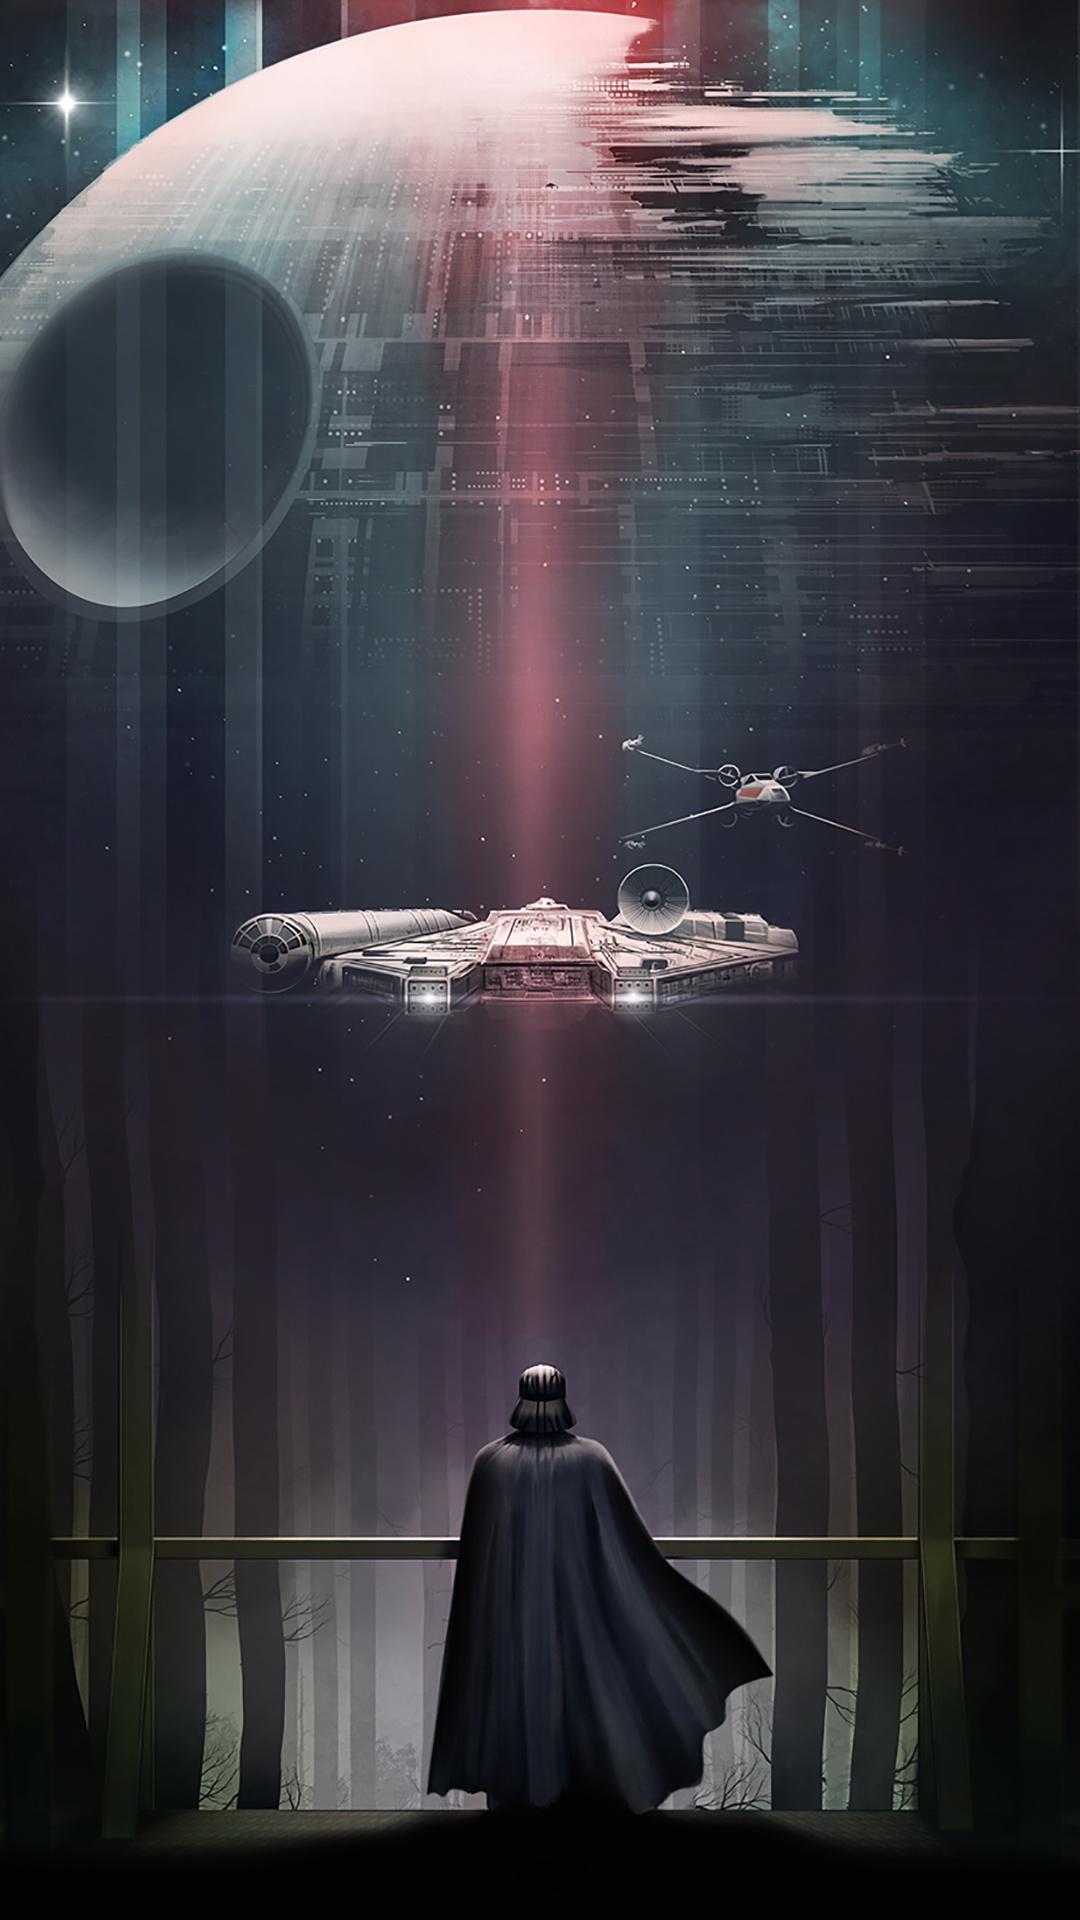 Star Wars mobile wallpaper